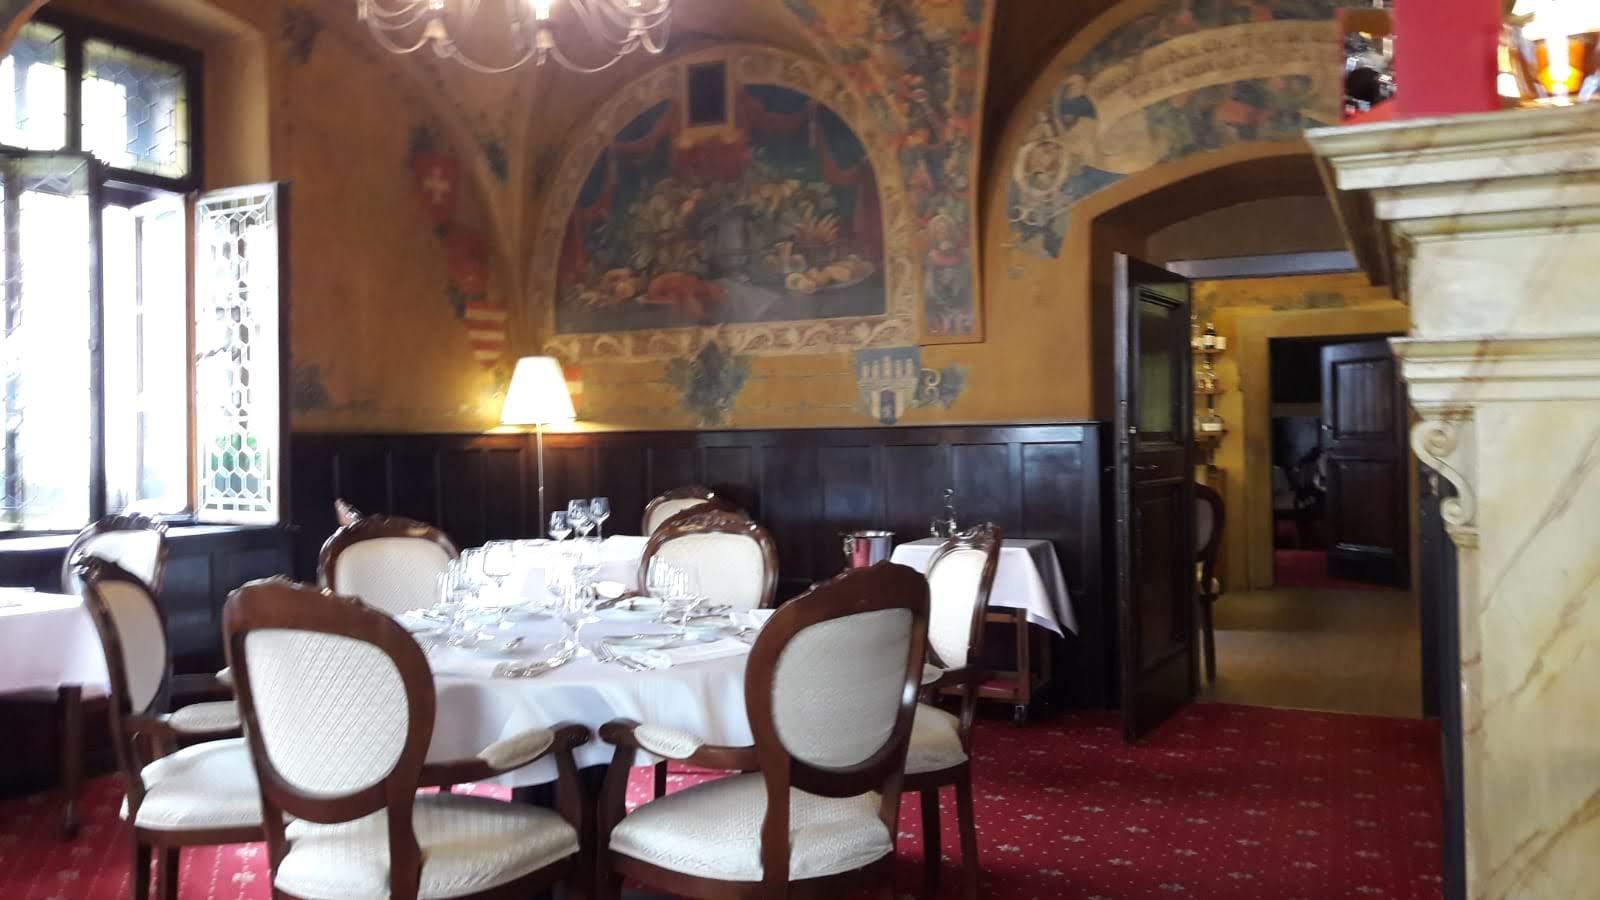 Výjimečný interiérový design restaurace U Malířů